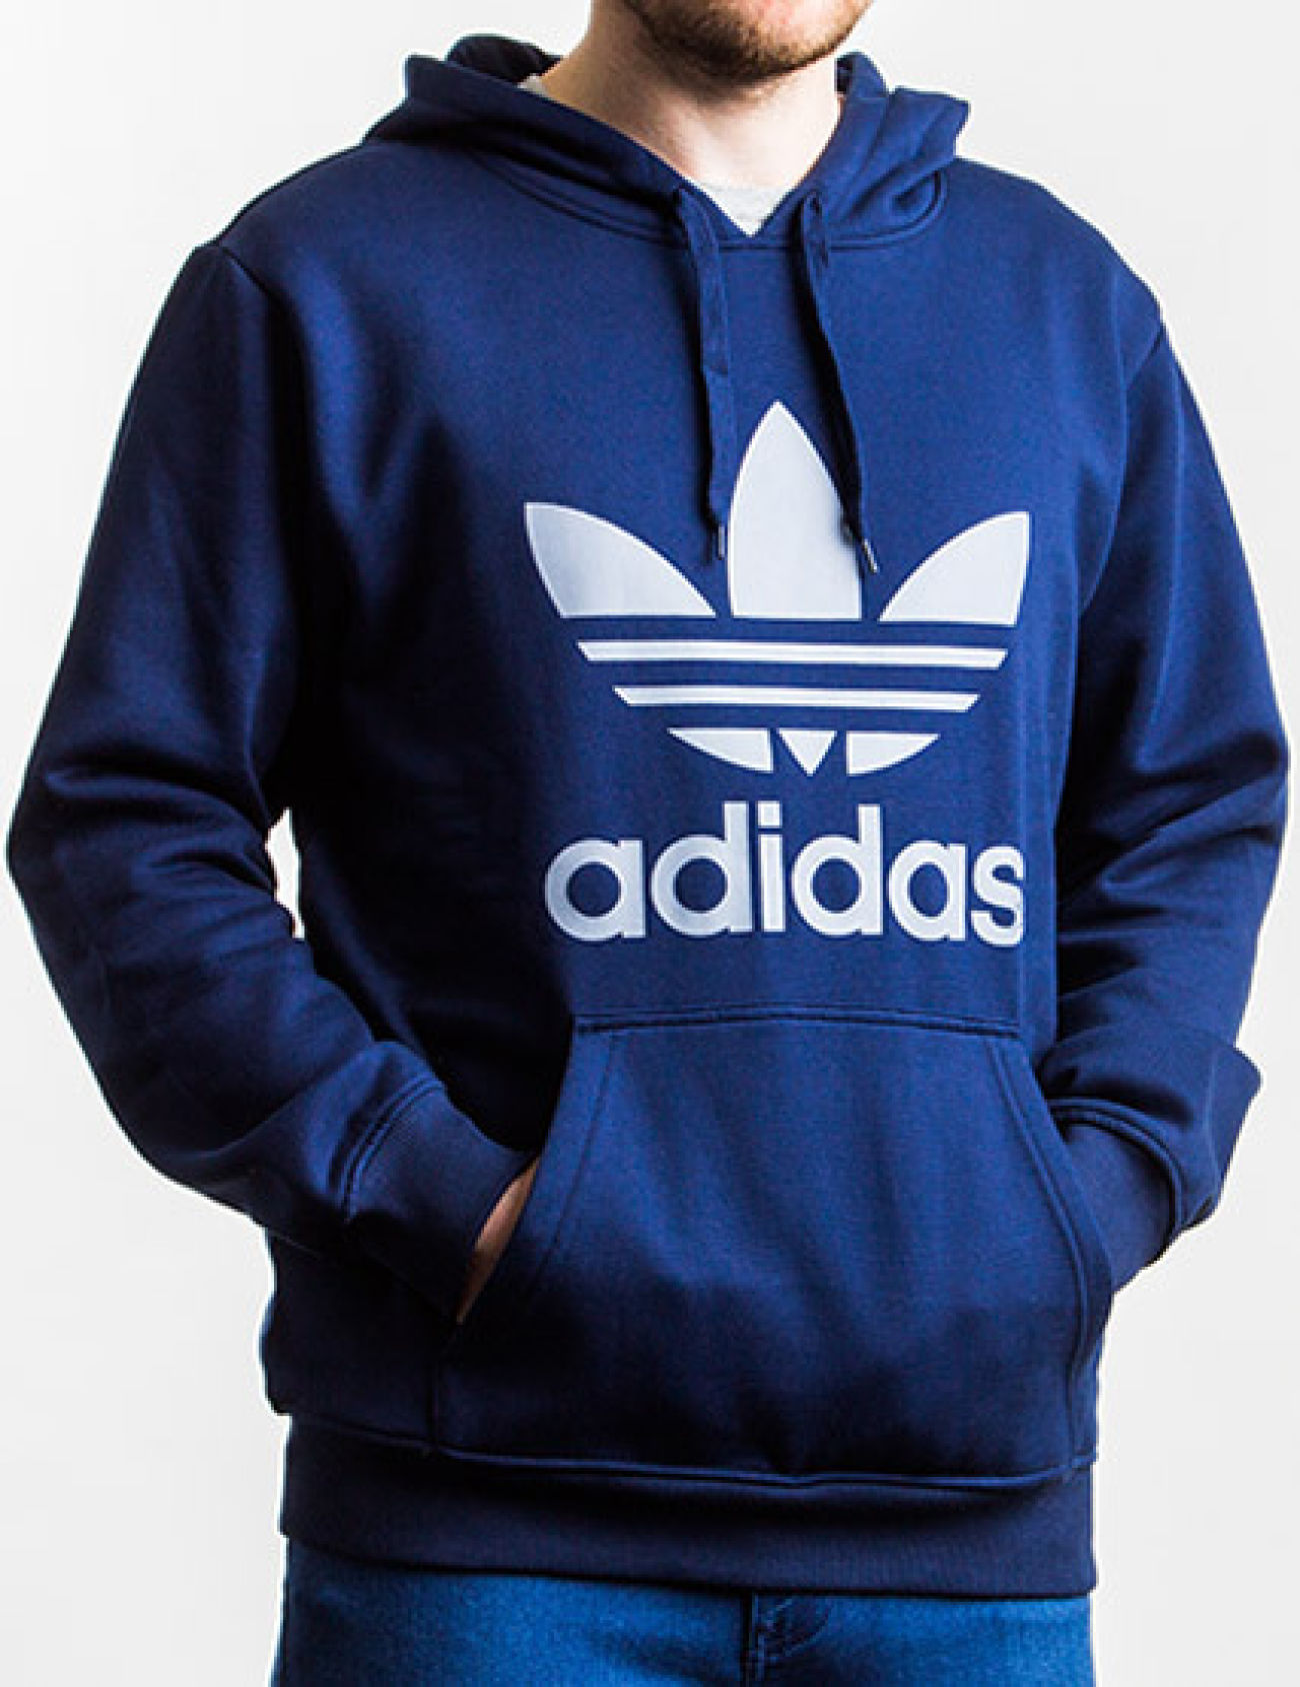 adidas sweatshirt size chart